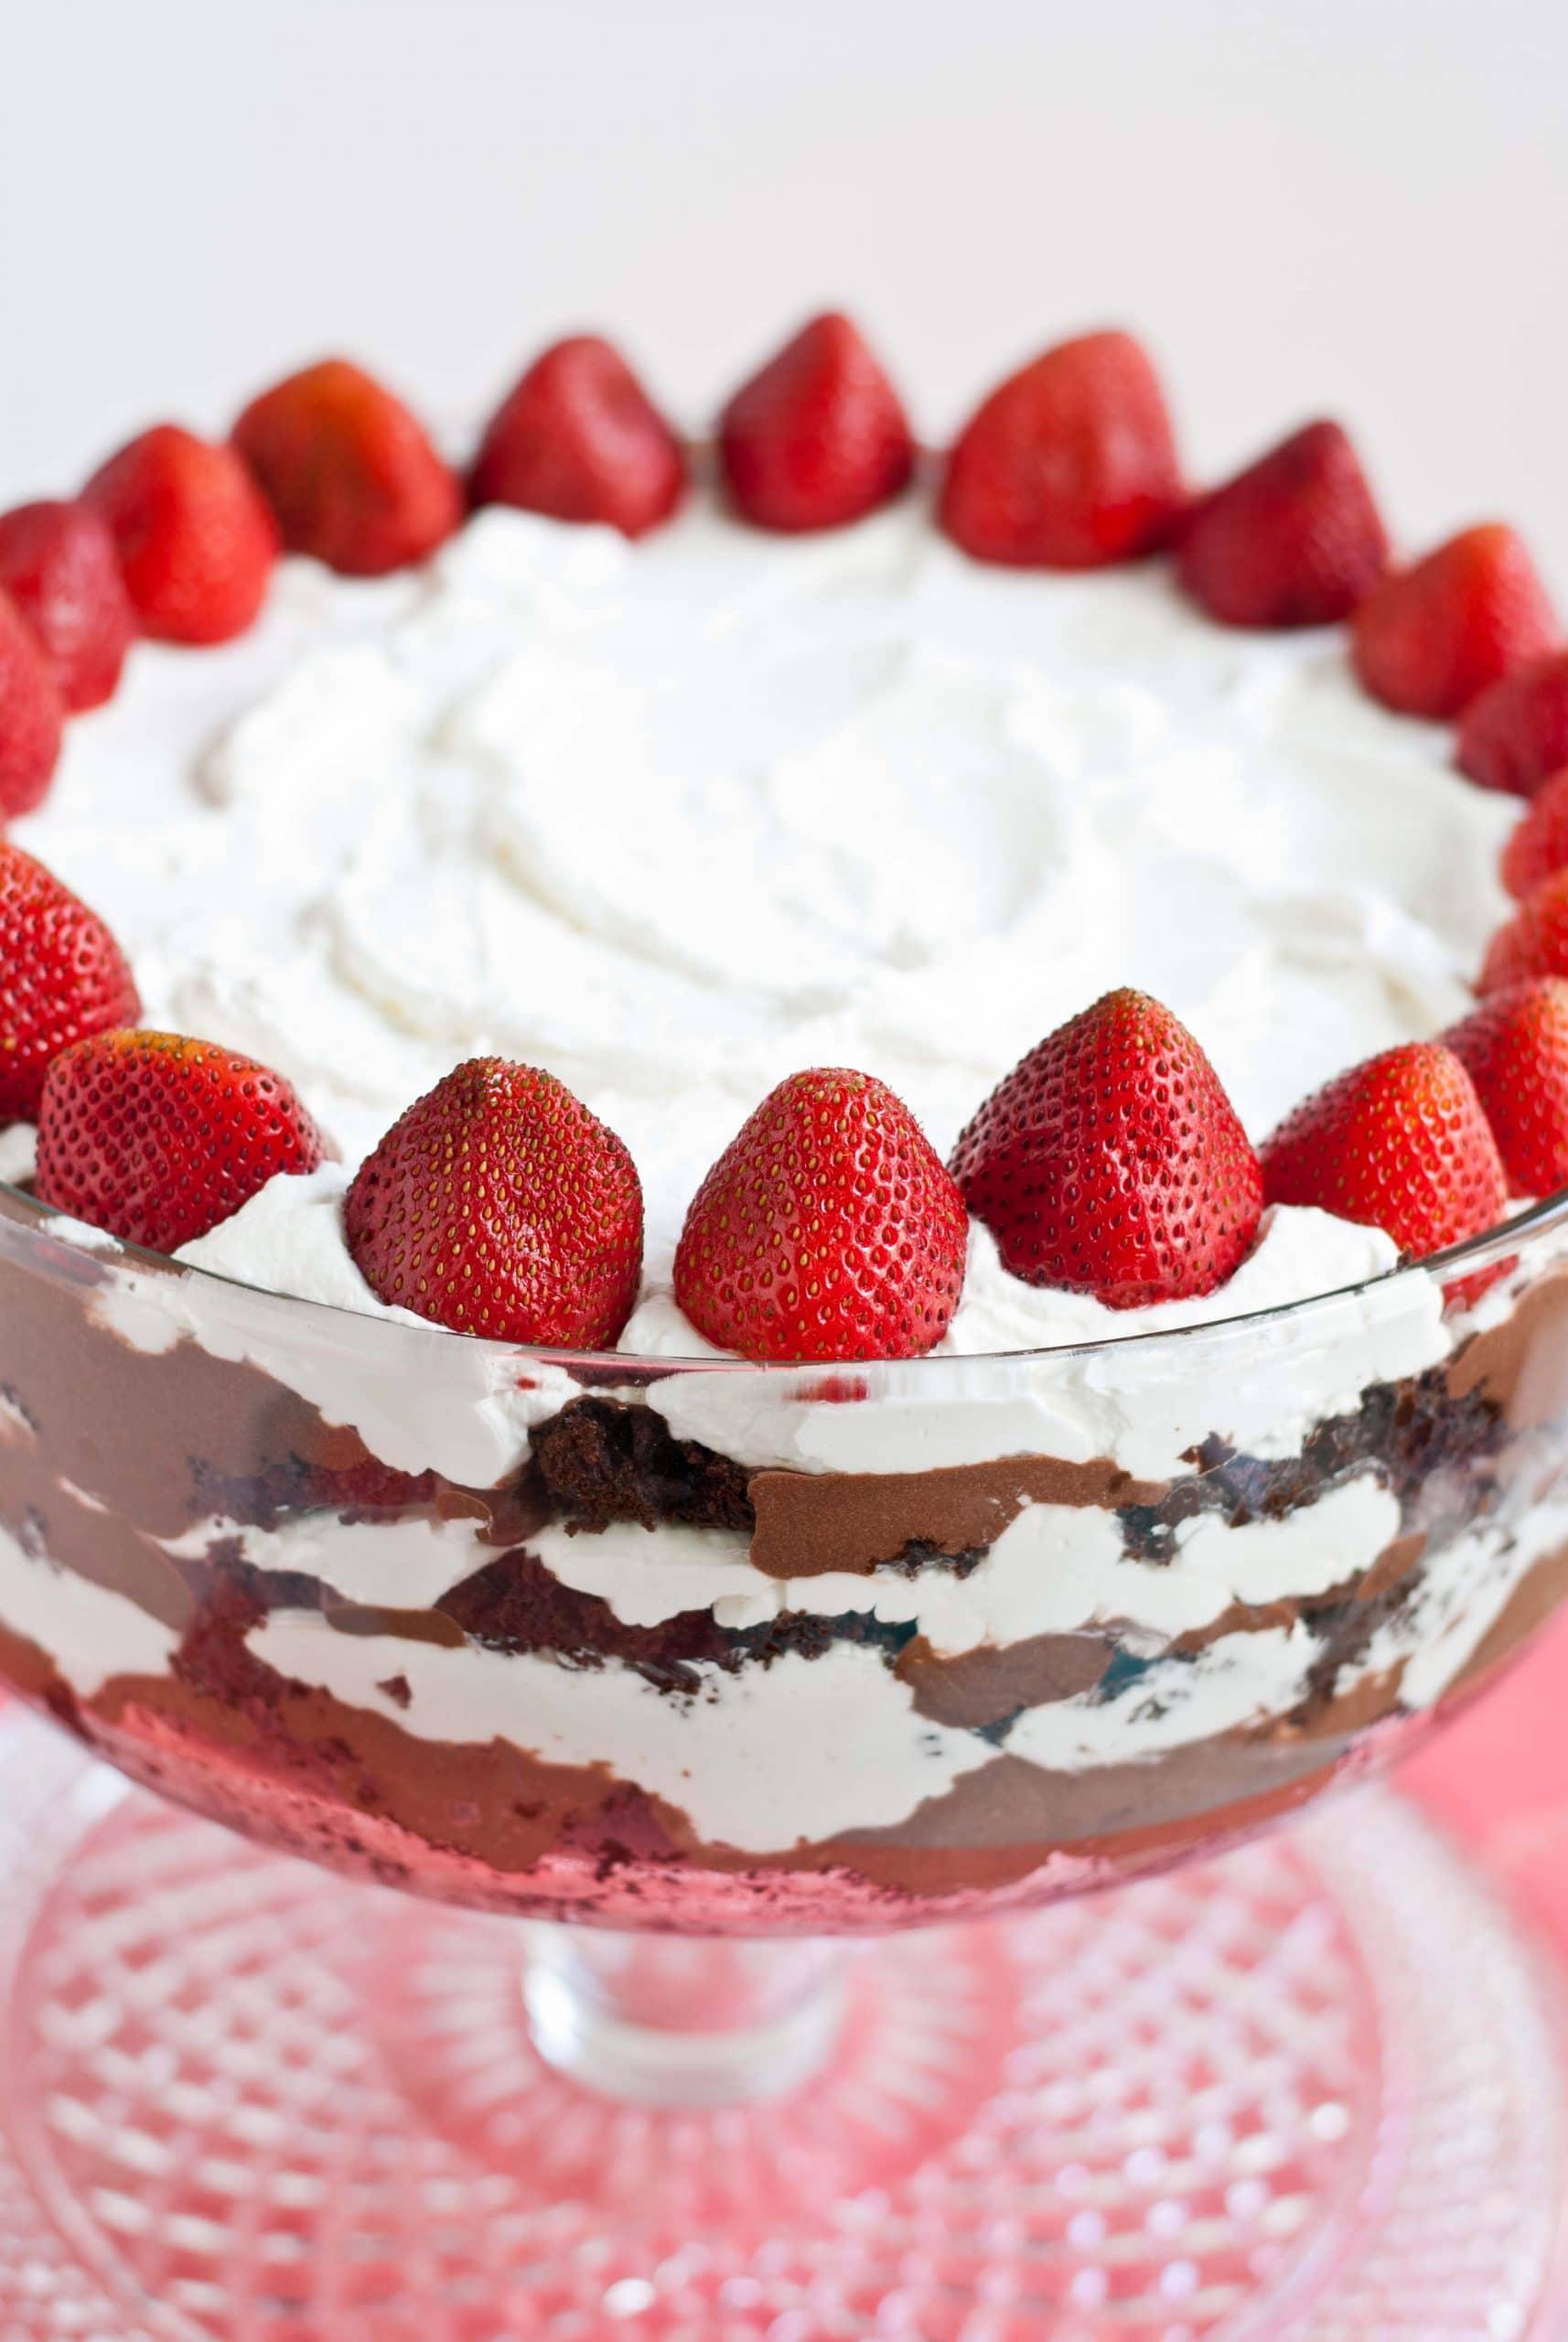 Triple Chocolate Punch Bowl Cake | Neighborfoodblog.com